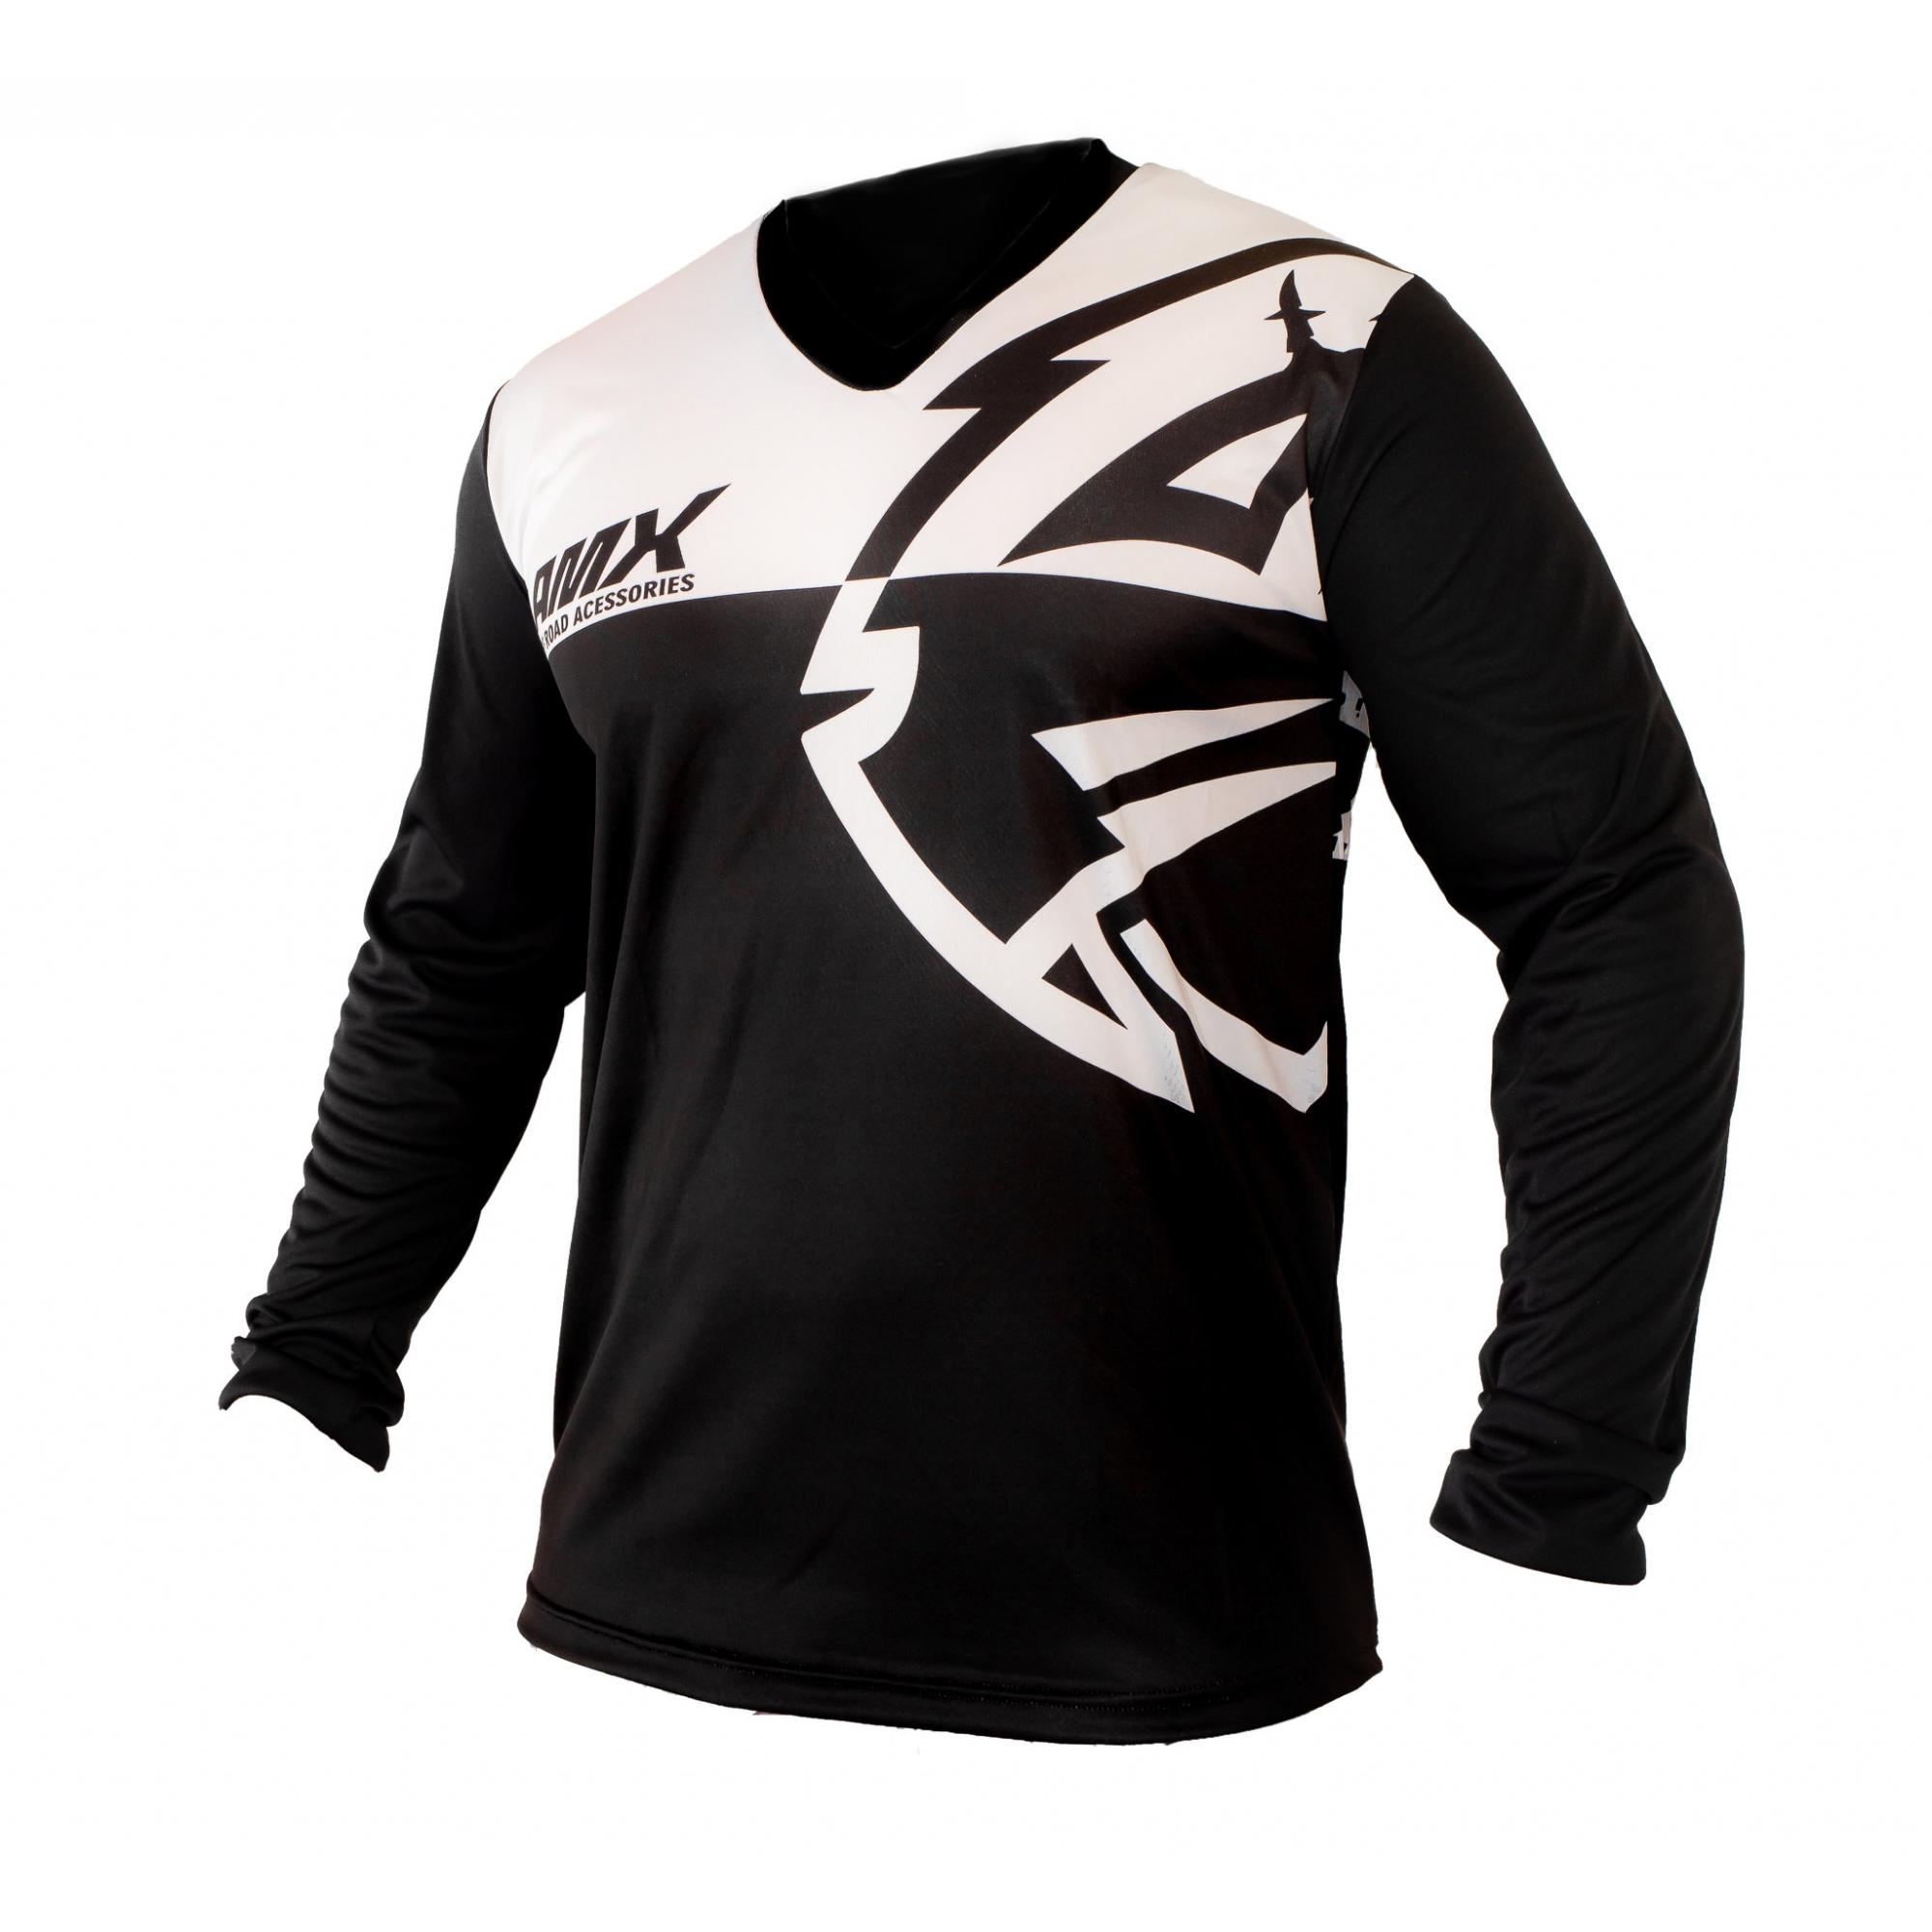 Camisa Amx Classic Preto Branco Trilha Motocross